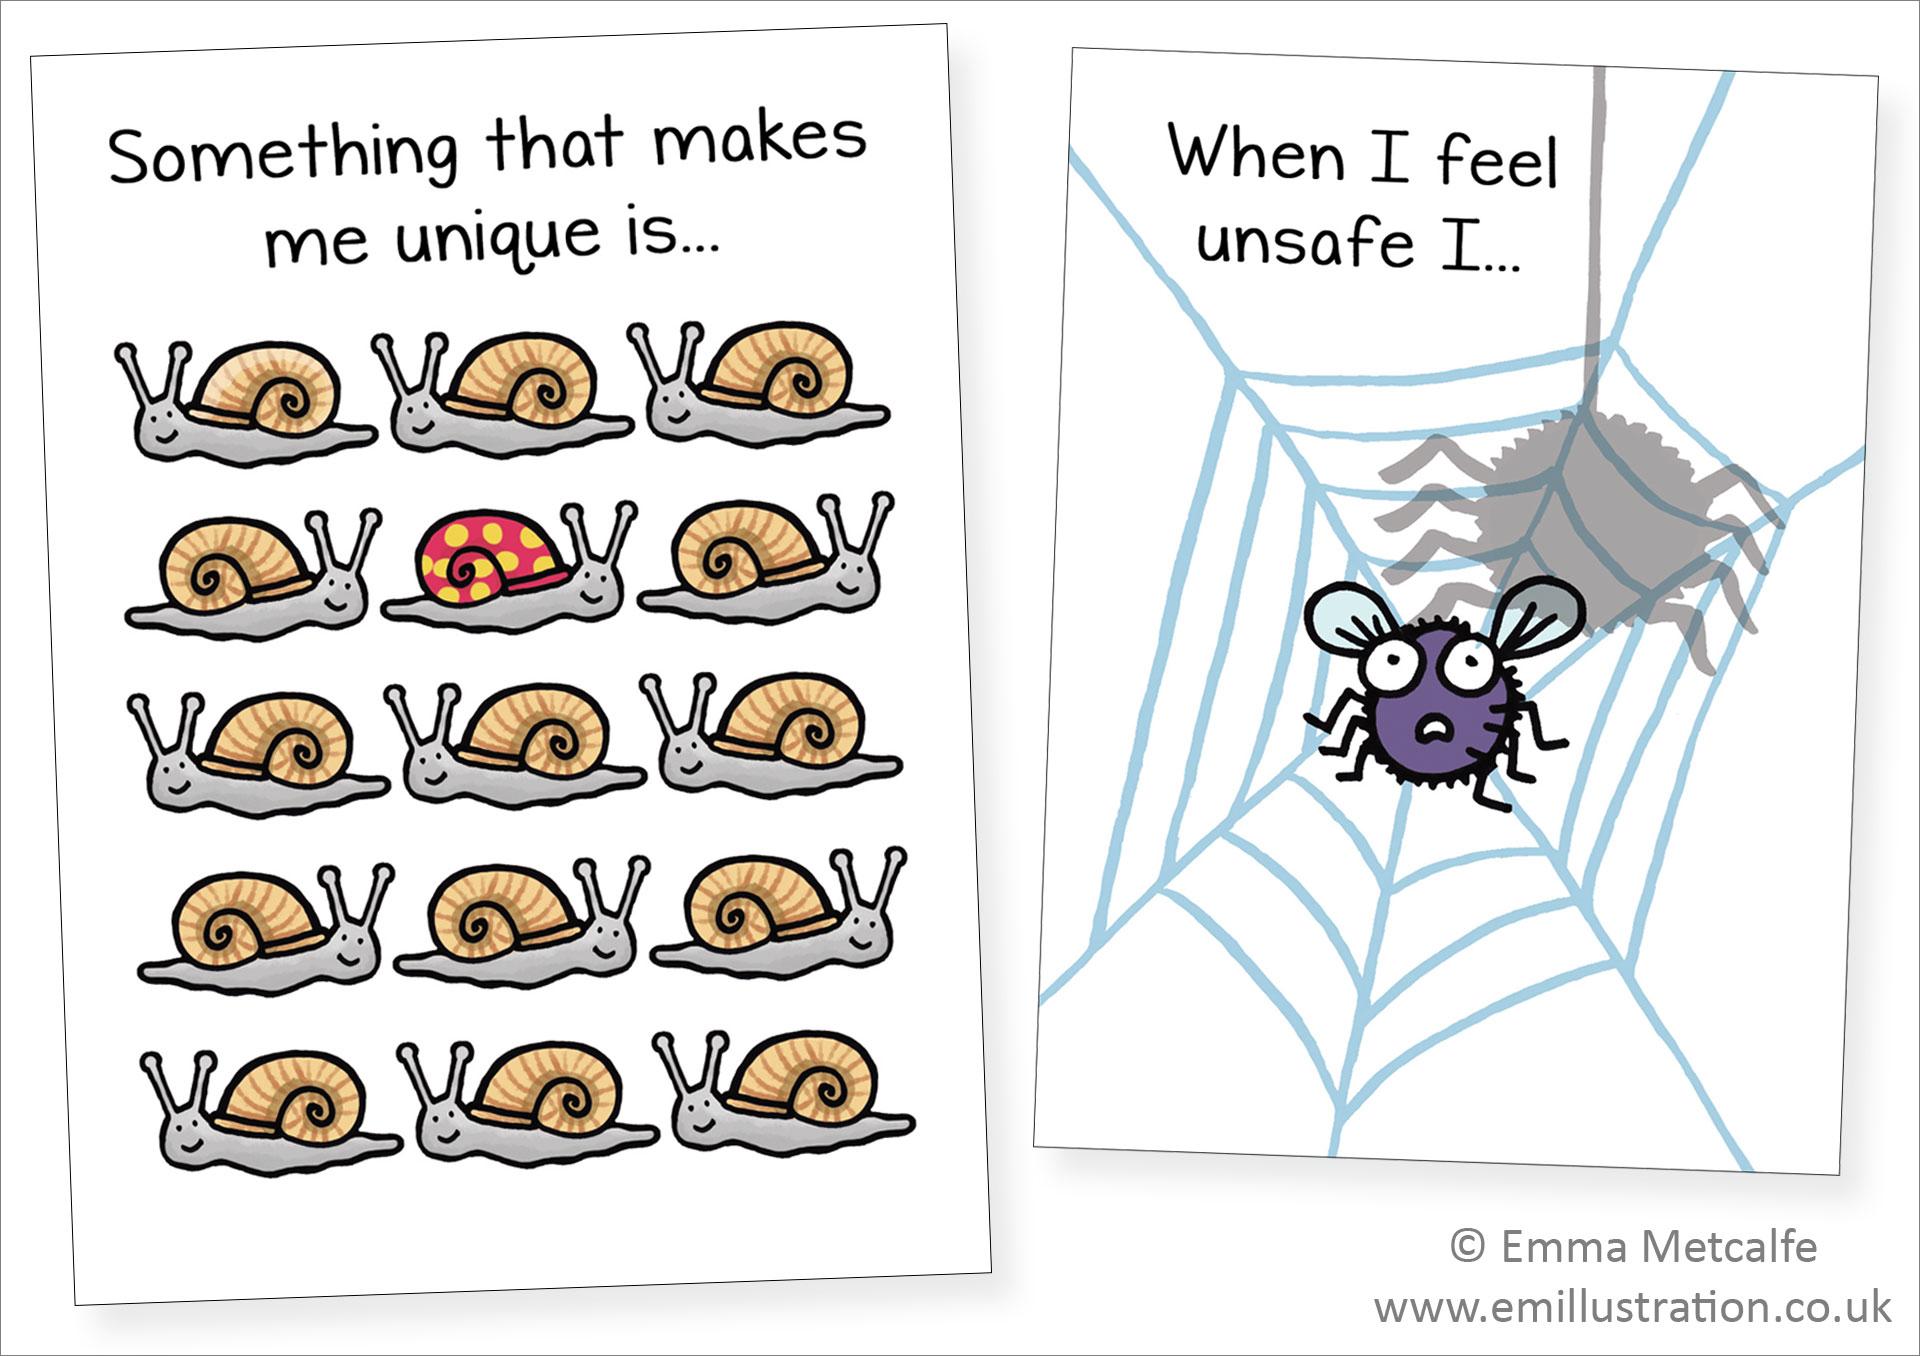 Animals Blog Emma Metcalfe Illustration